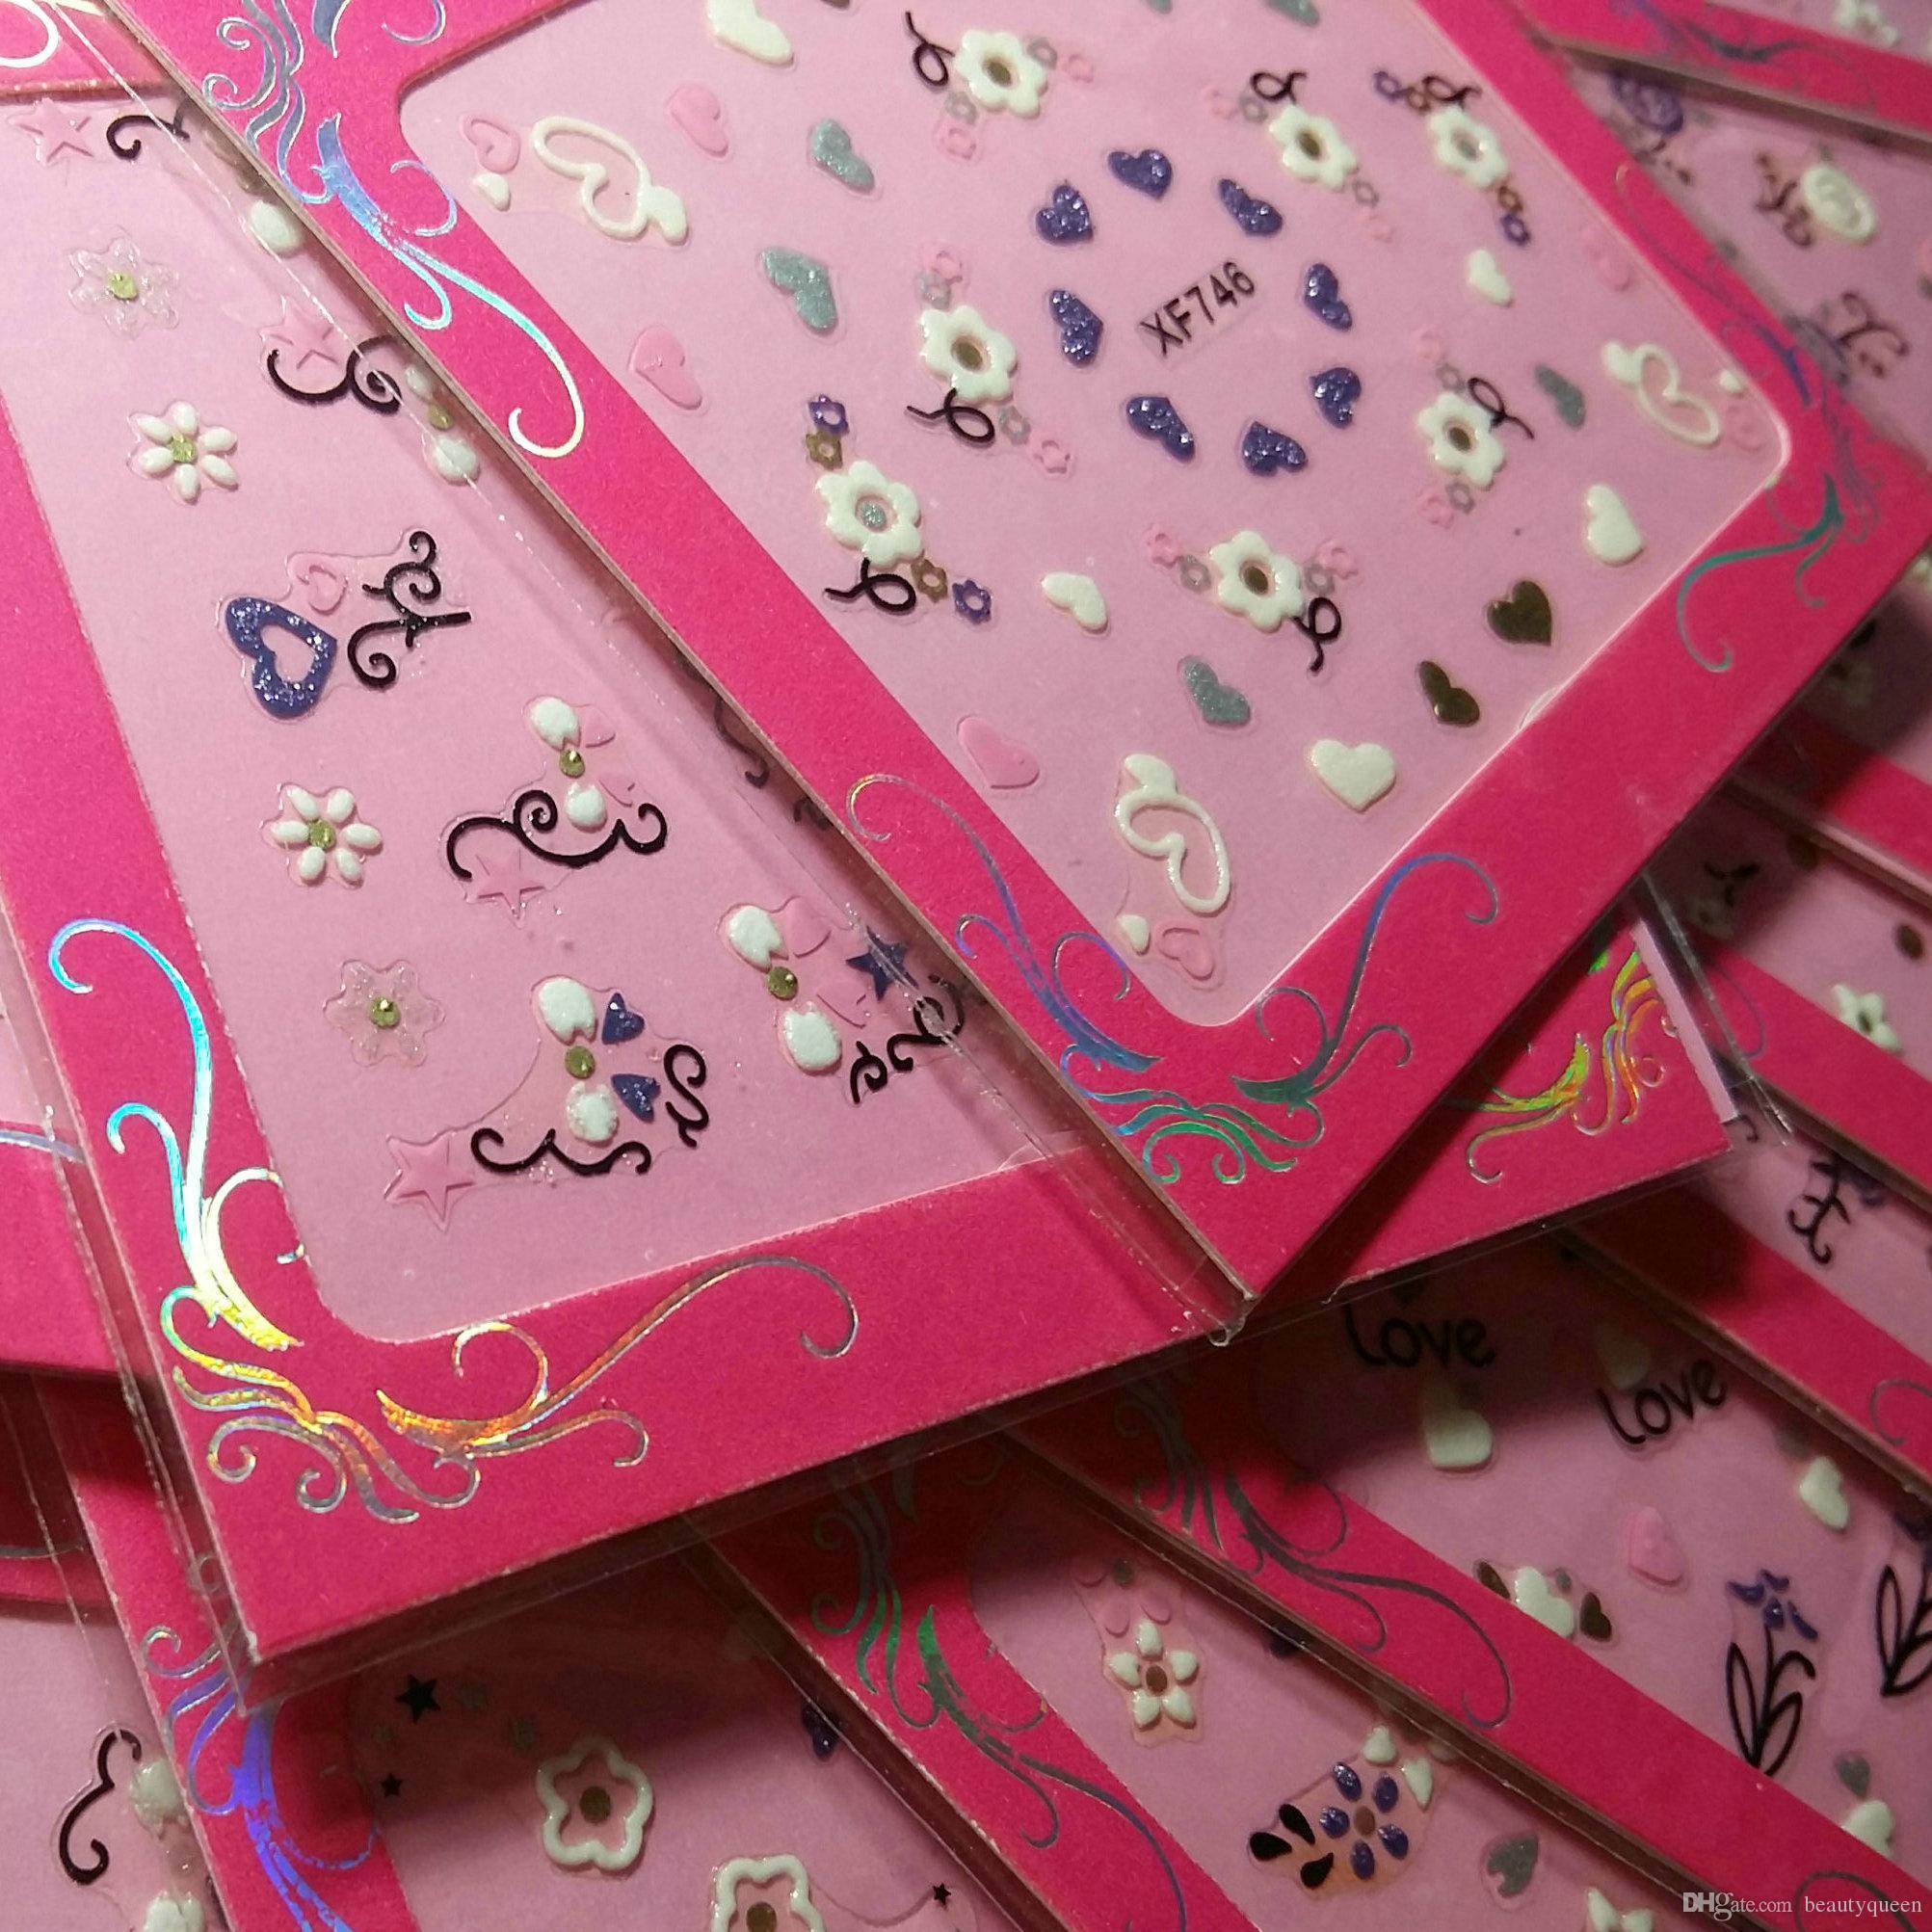 24 Stil Weiß, Rosa, Lila Balck Spitze-Blumen-3D Nagel-Kunst-Abziehbild-Aufkleber Aufkleber Glitter Aufkleber Tipps Dekorative Übertragung Acryl UV Gel NEU